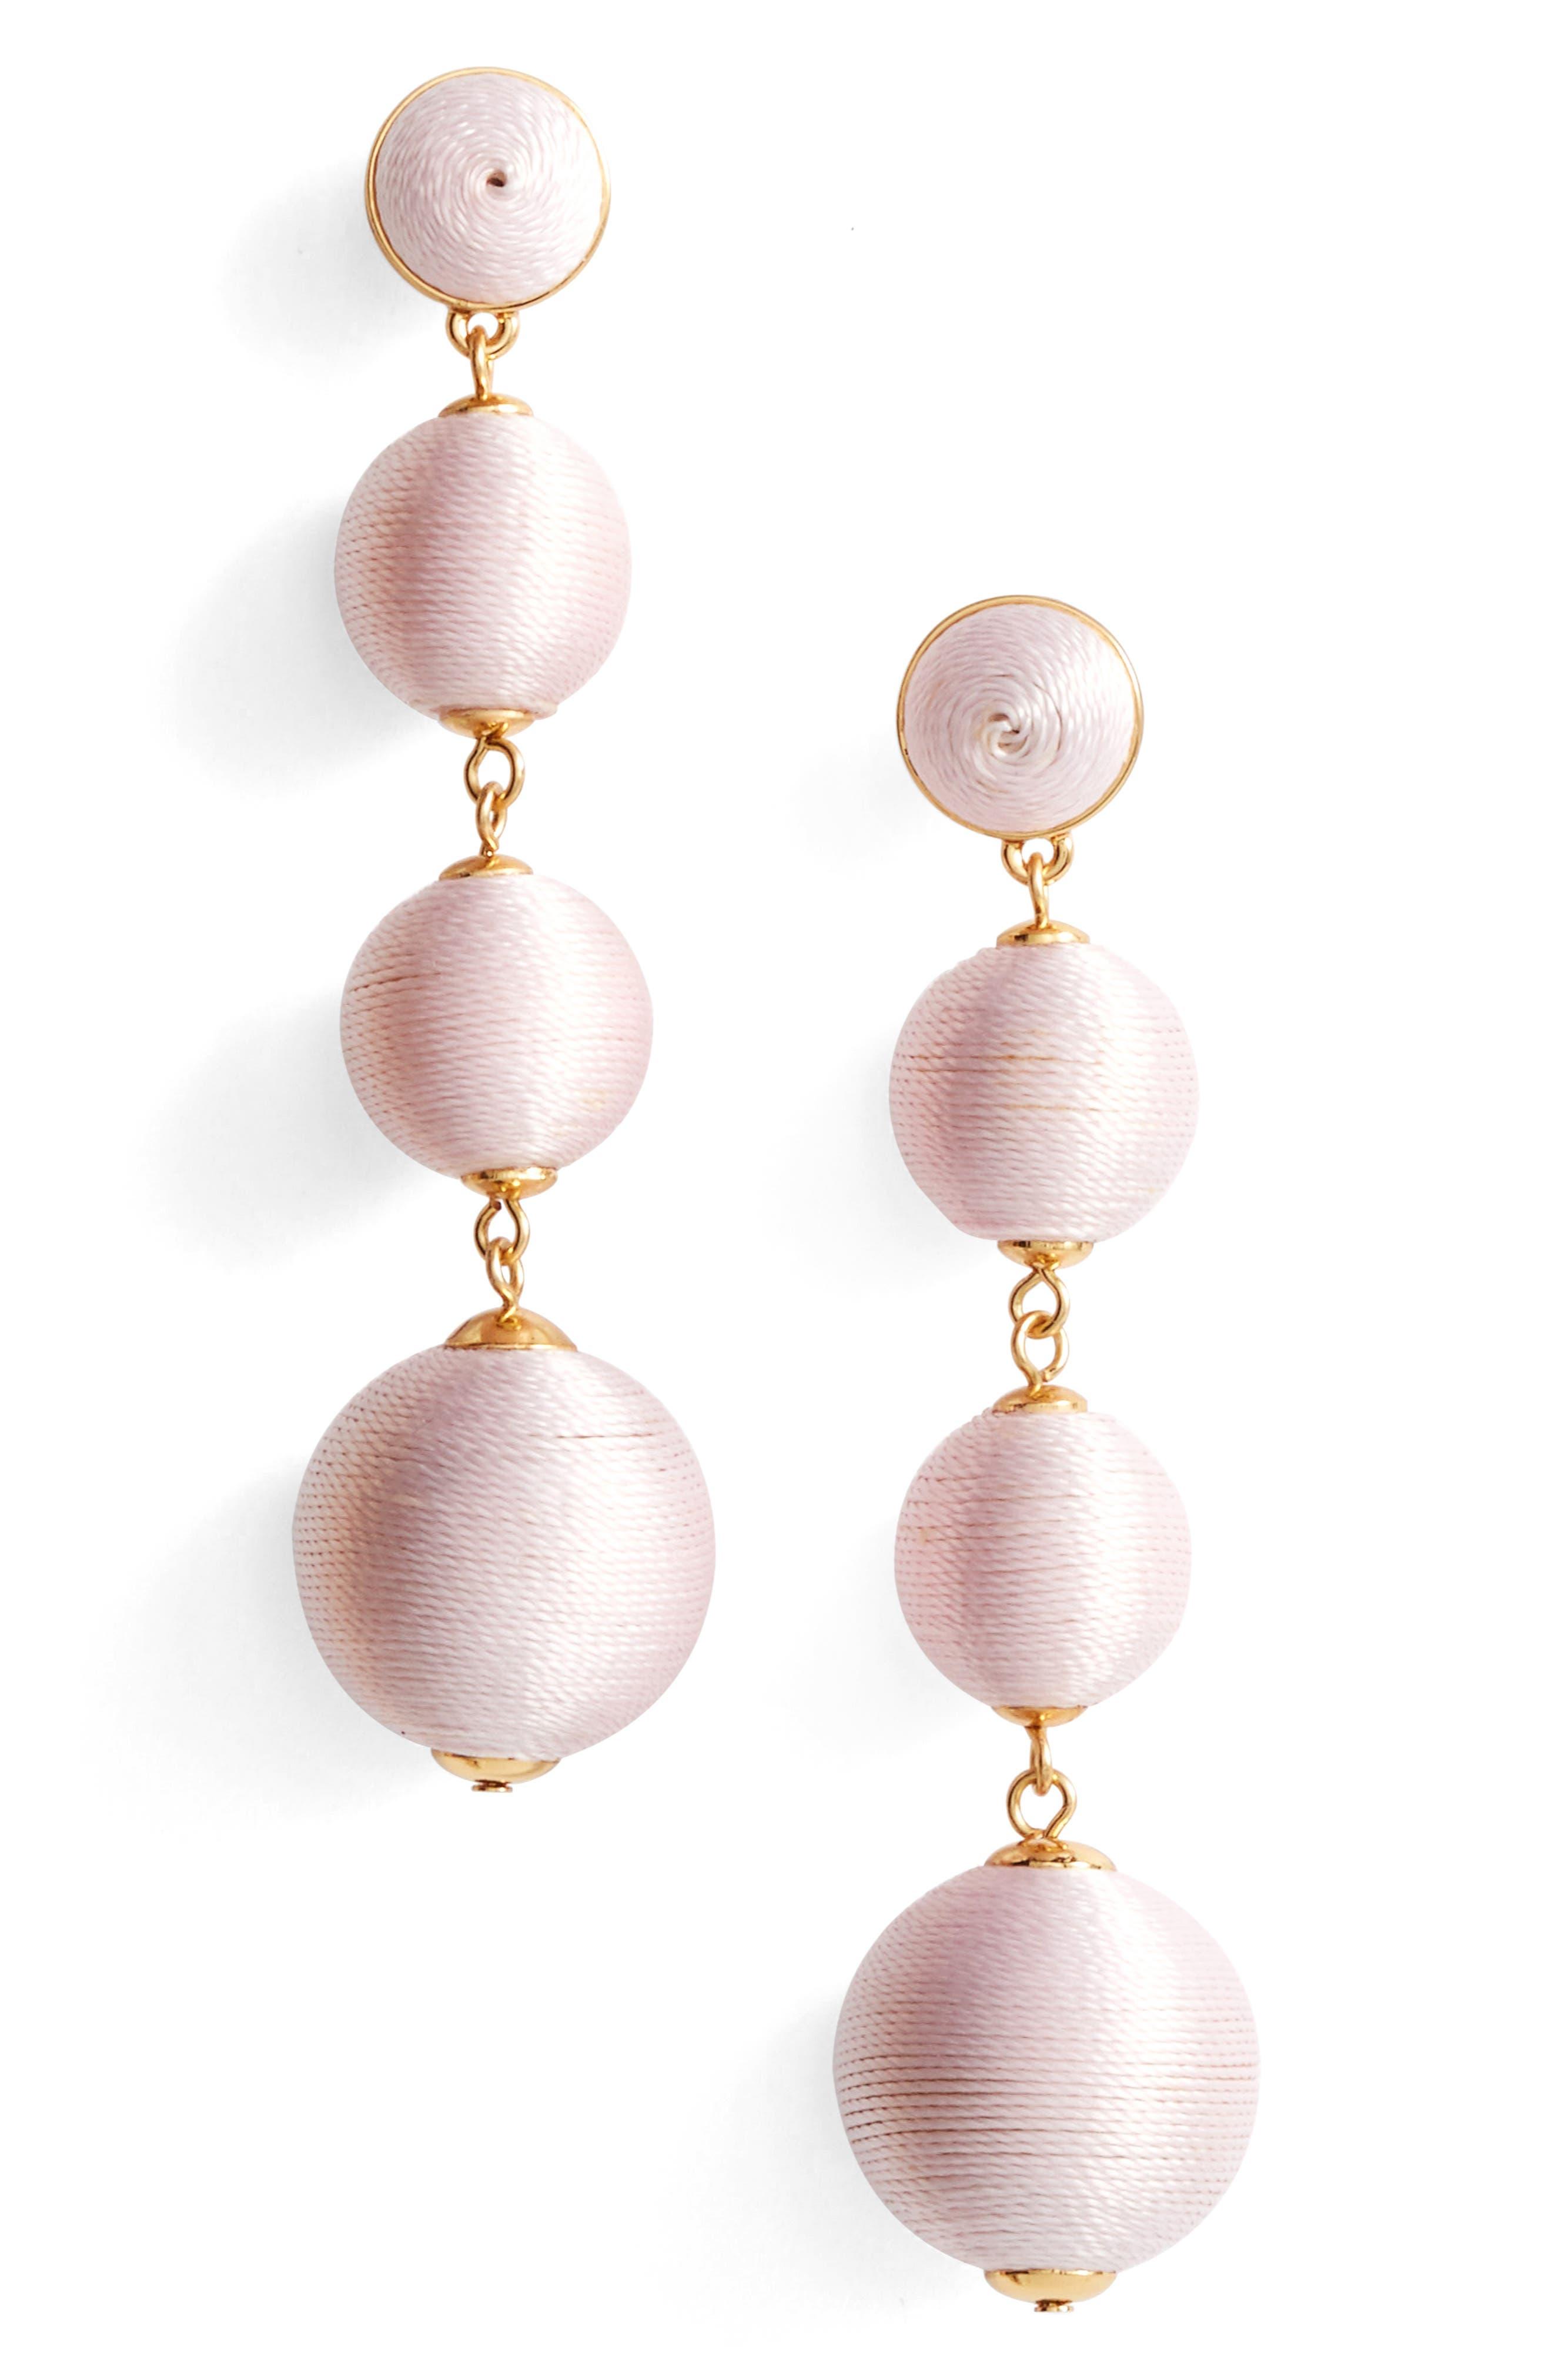 Criselda Ball Shoulder Duster Earrings,                             Main thumbnail 8, color,